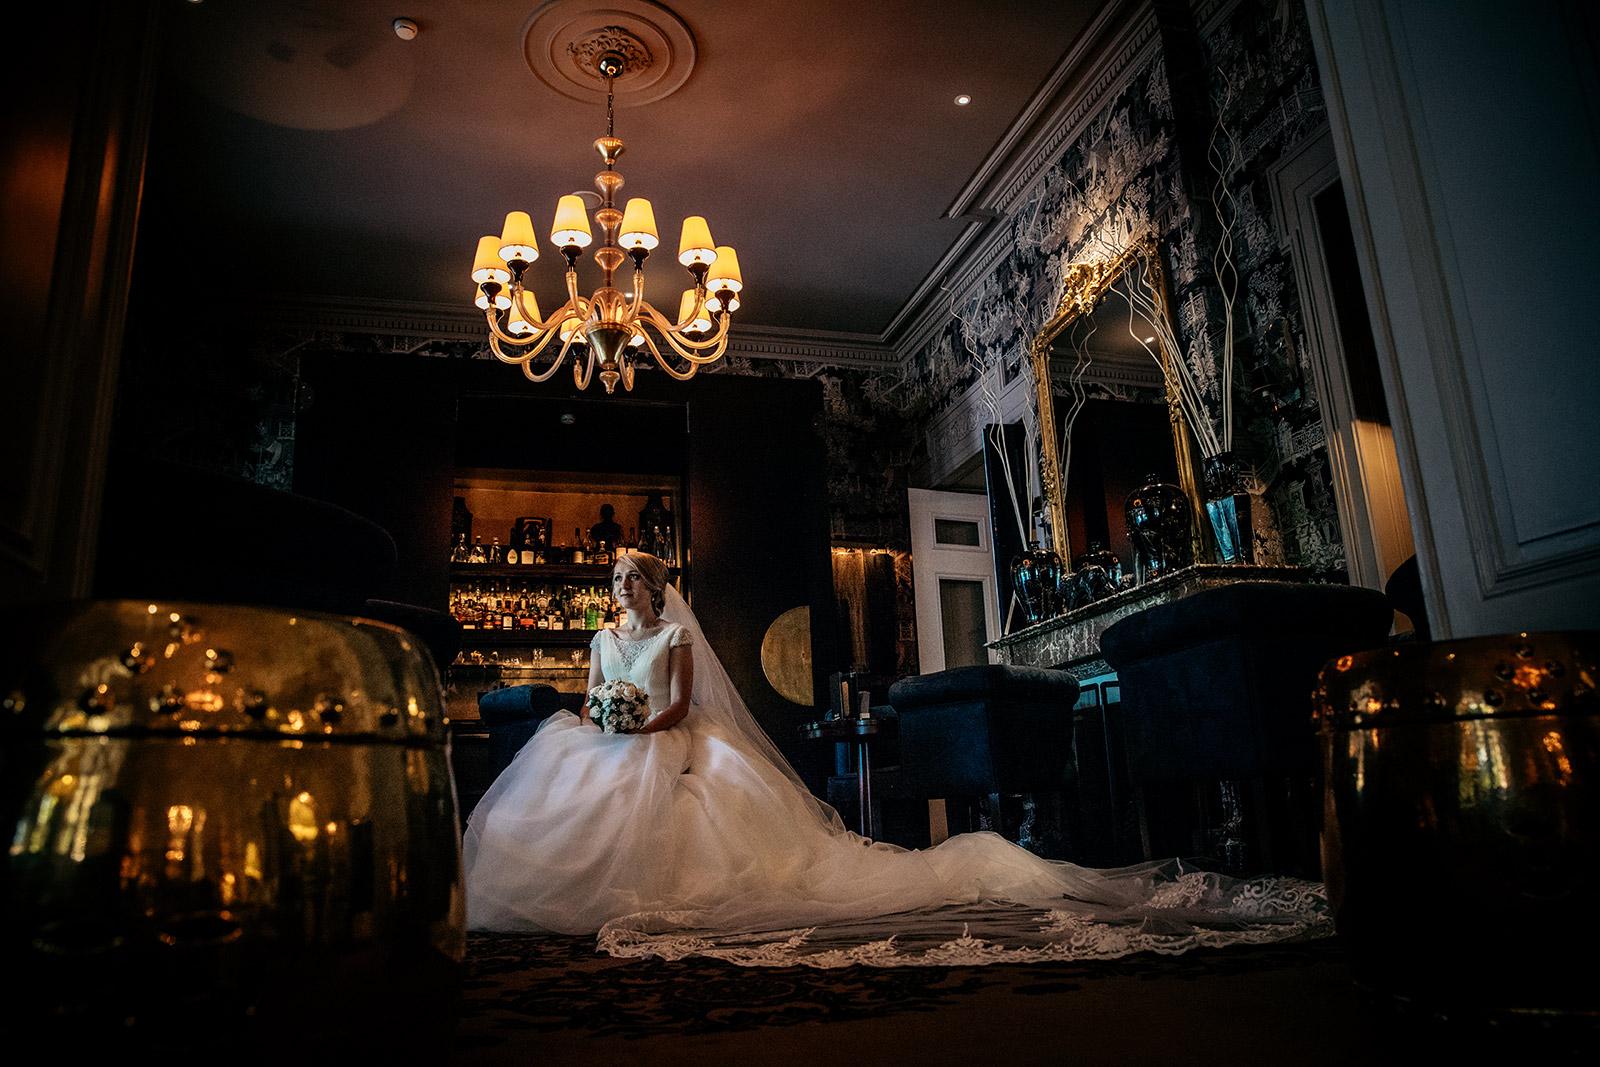 meilleur avis photographe de mariage Vevey photographe de mariage grand hôtel du Lac Vevey